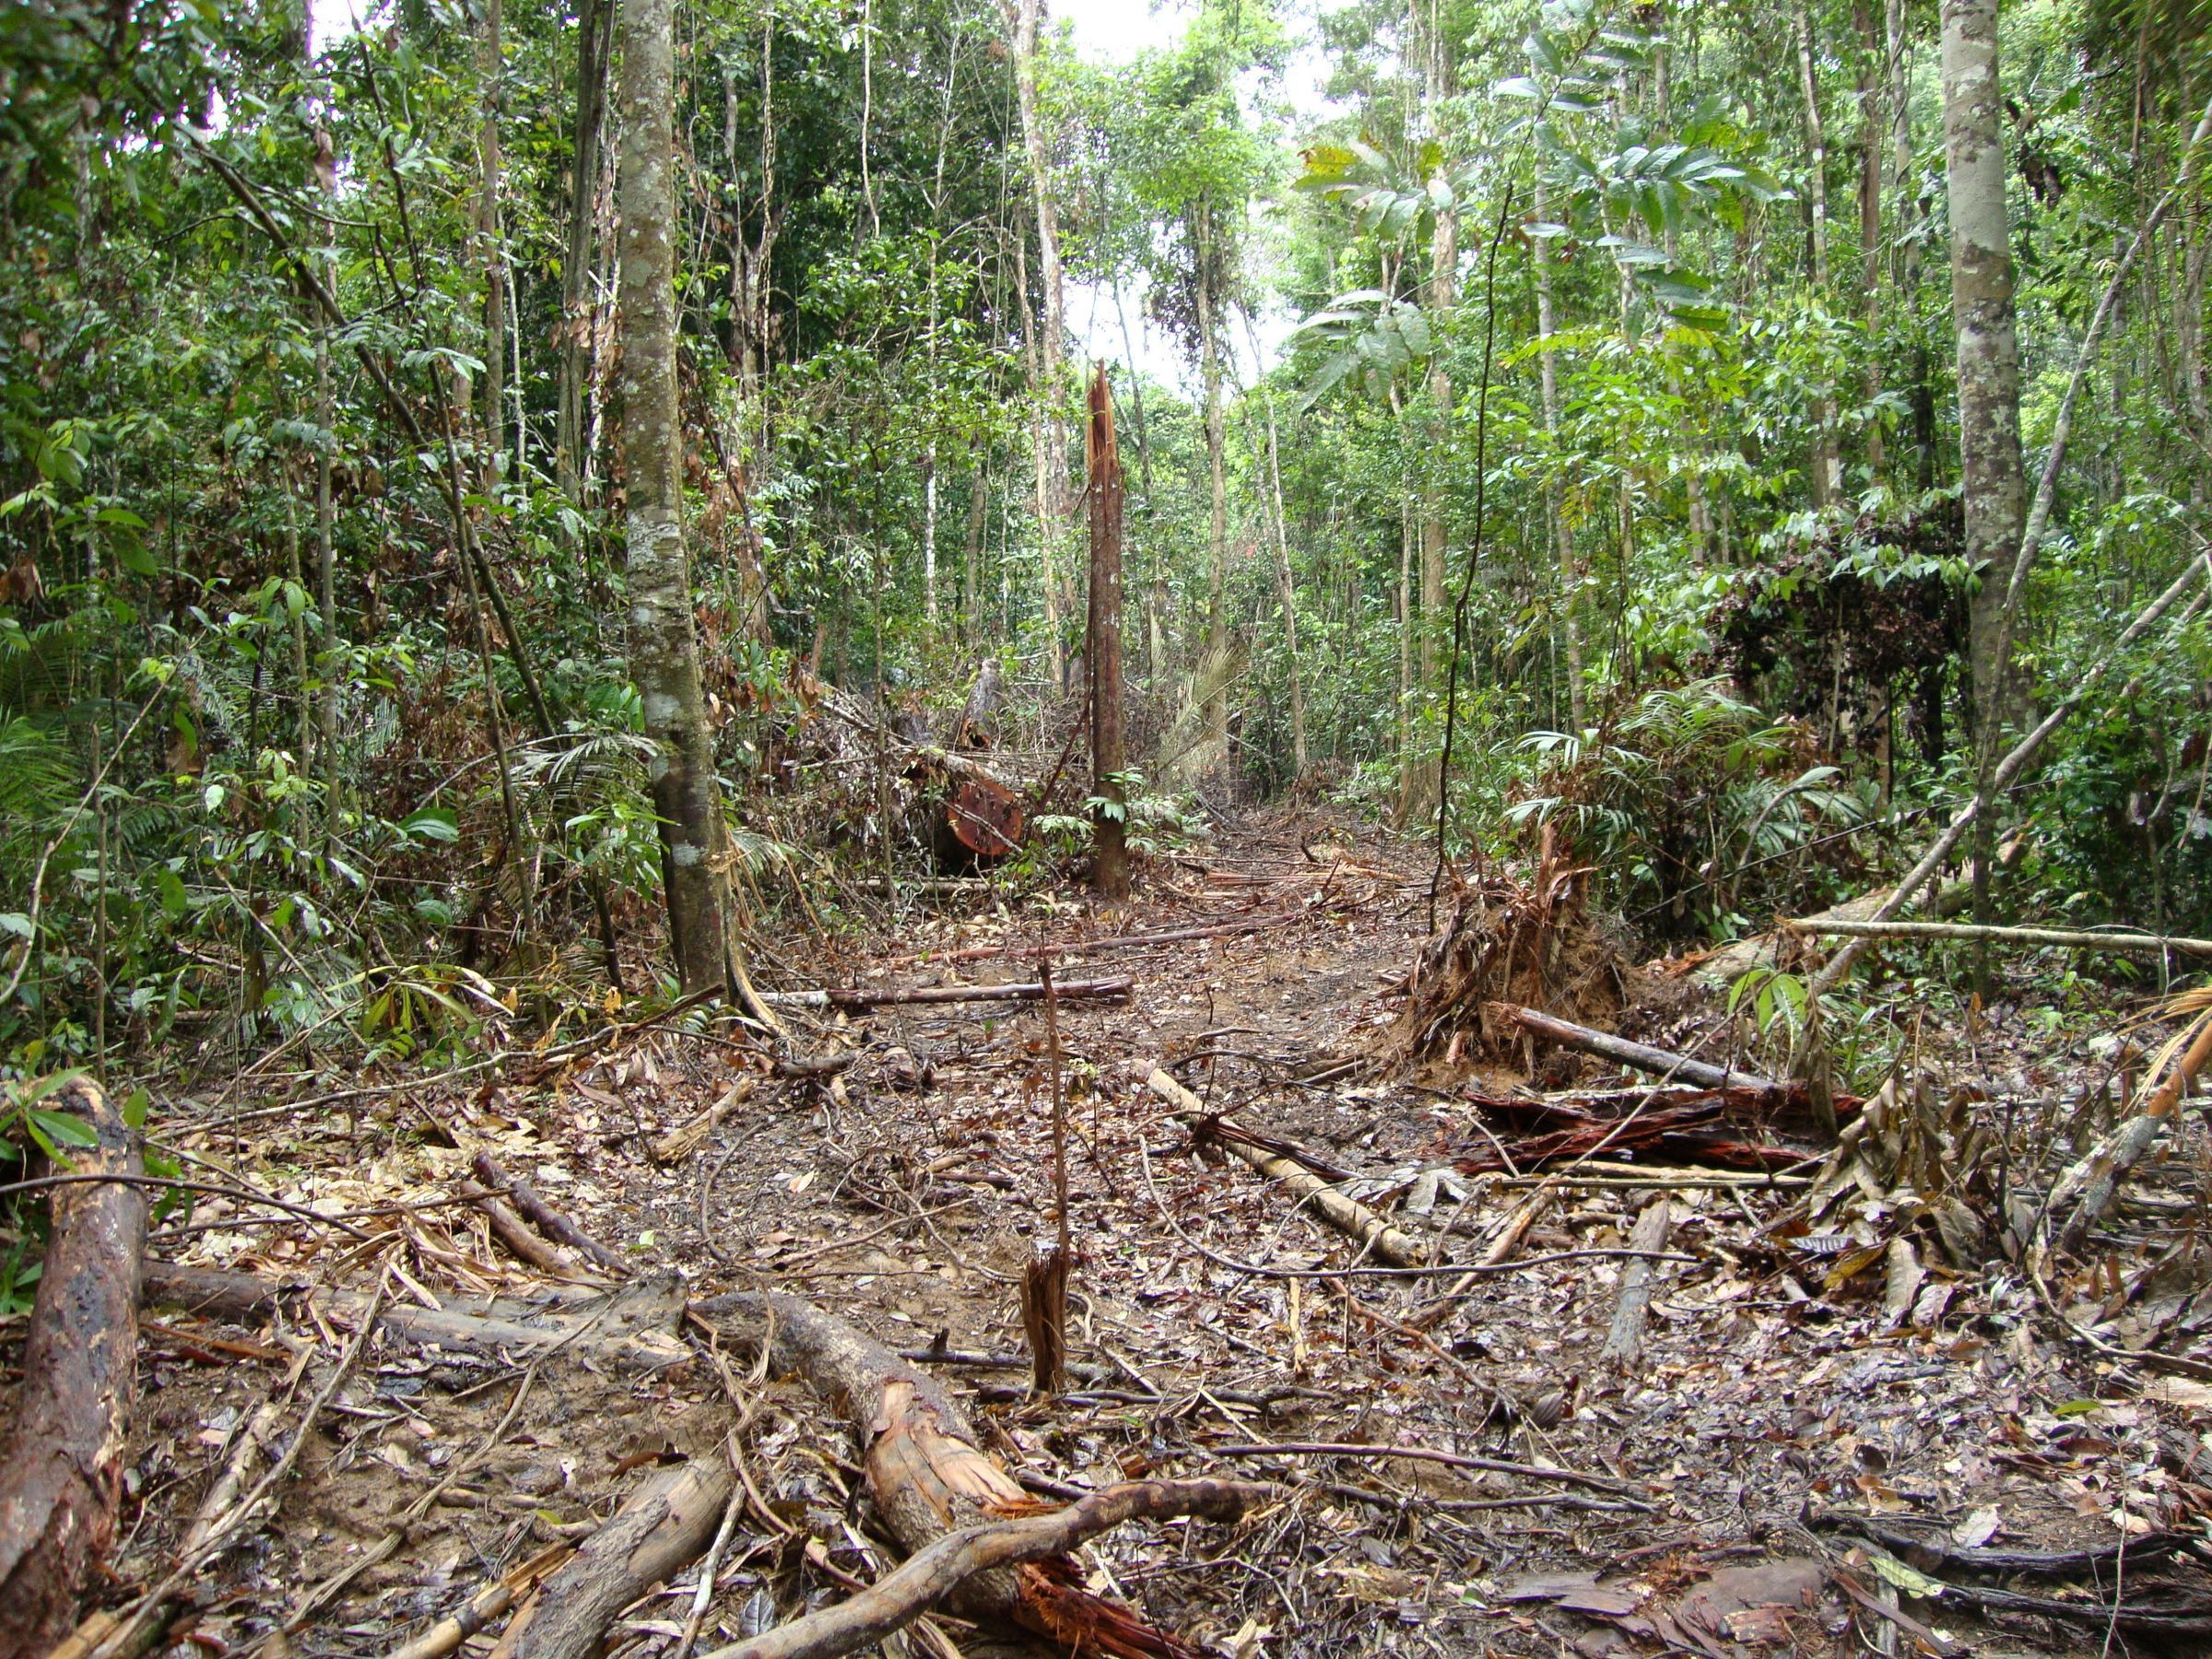 Devastação na Amazônia poderá desencadear a próxima pandemia